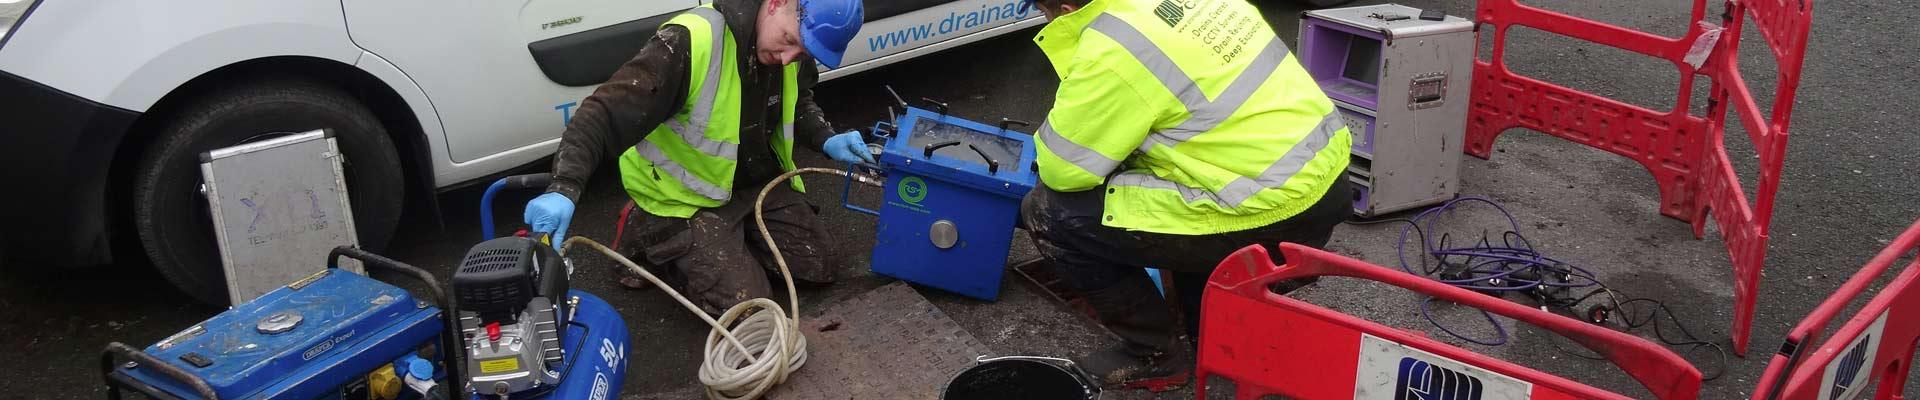 drain lining repairs